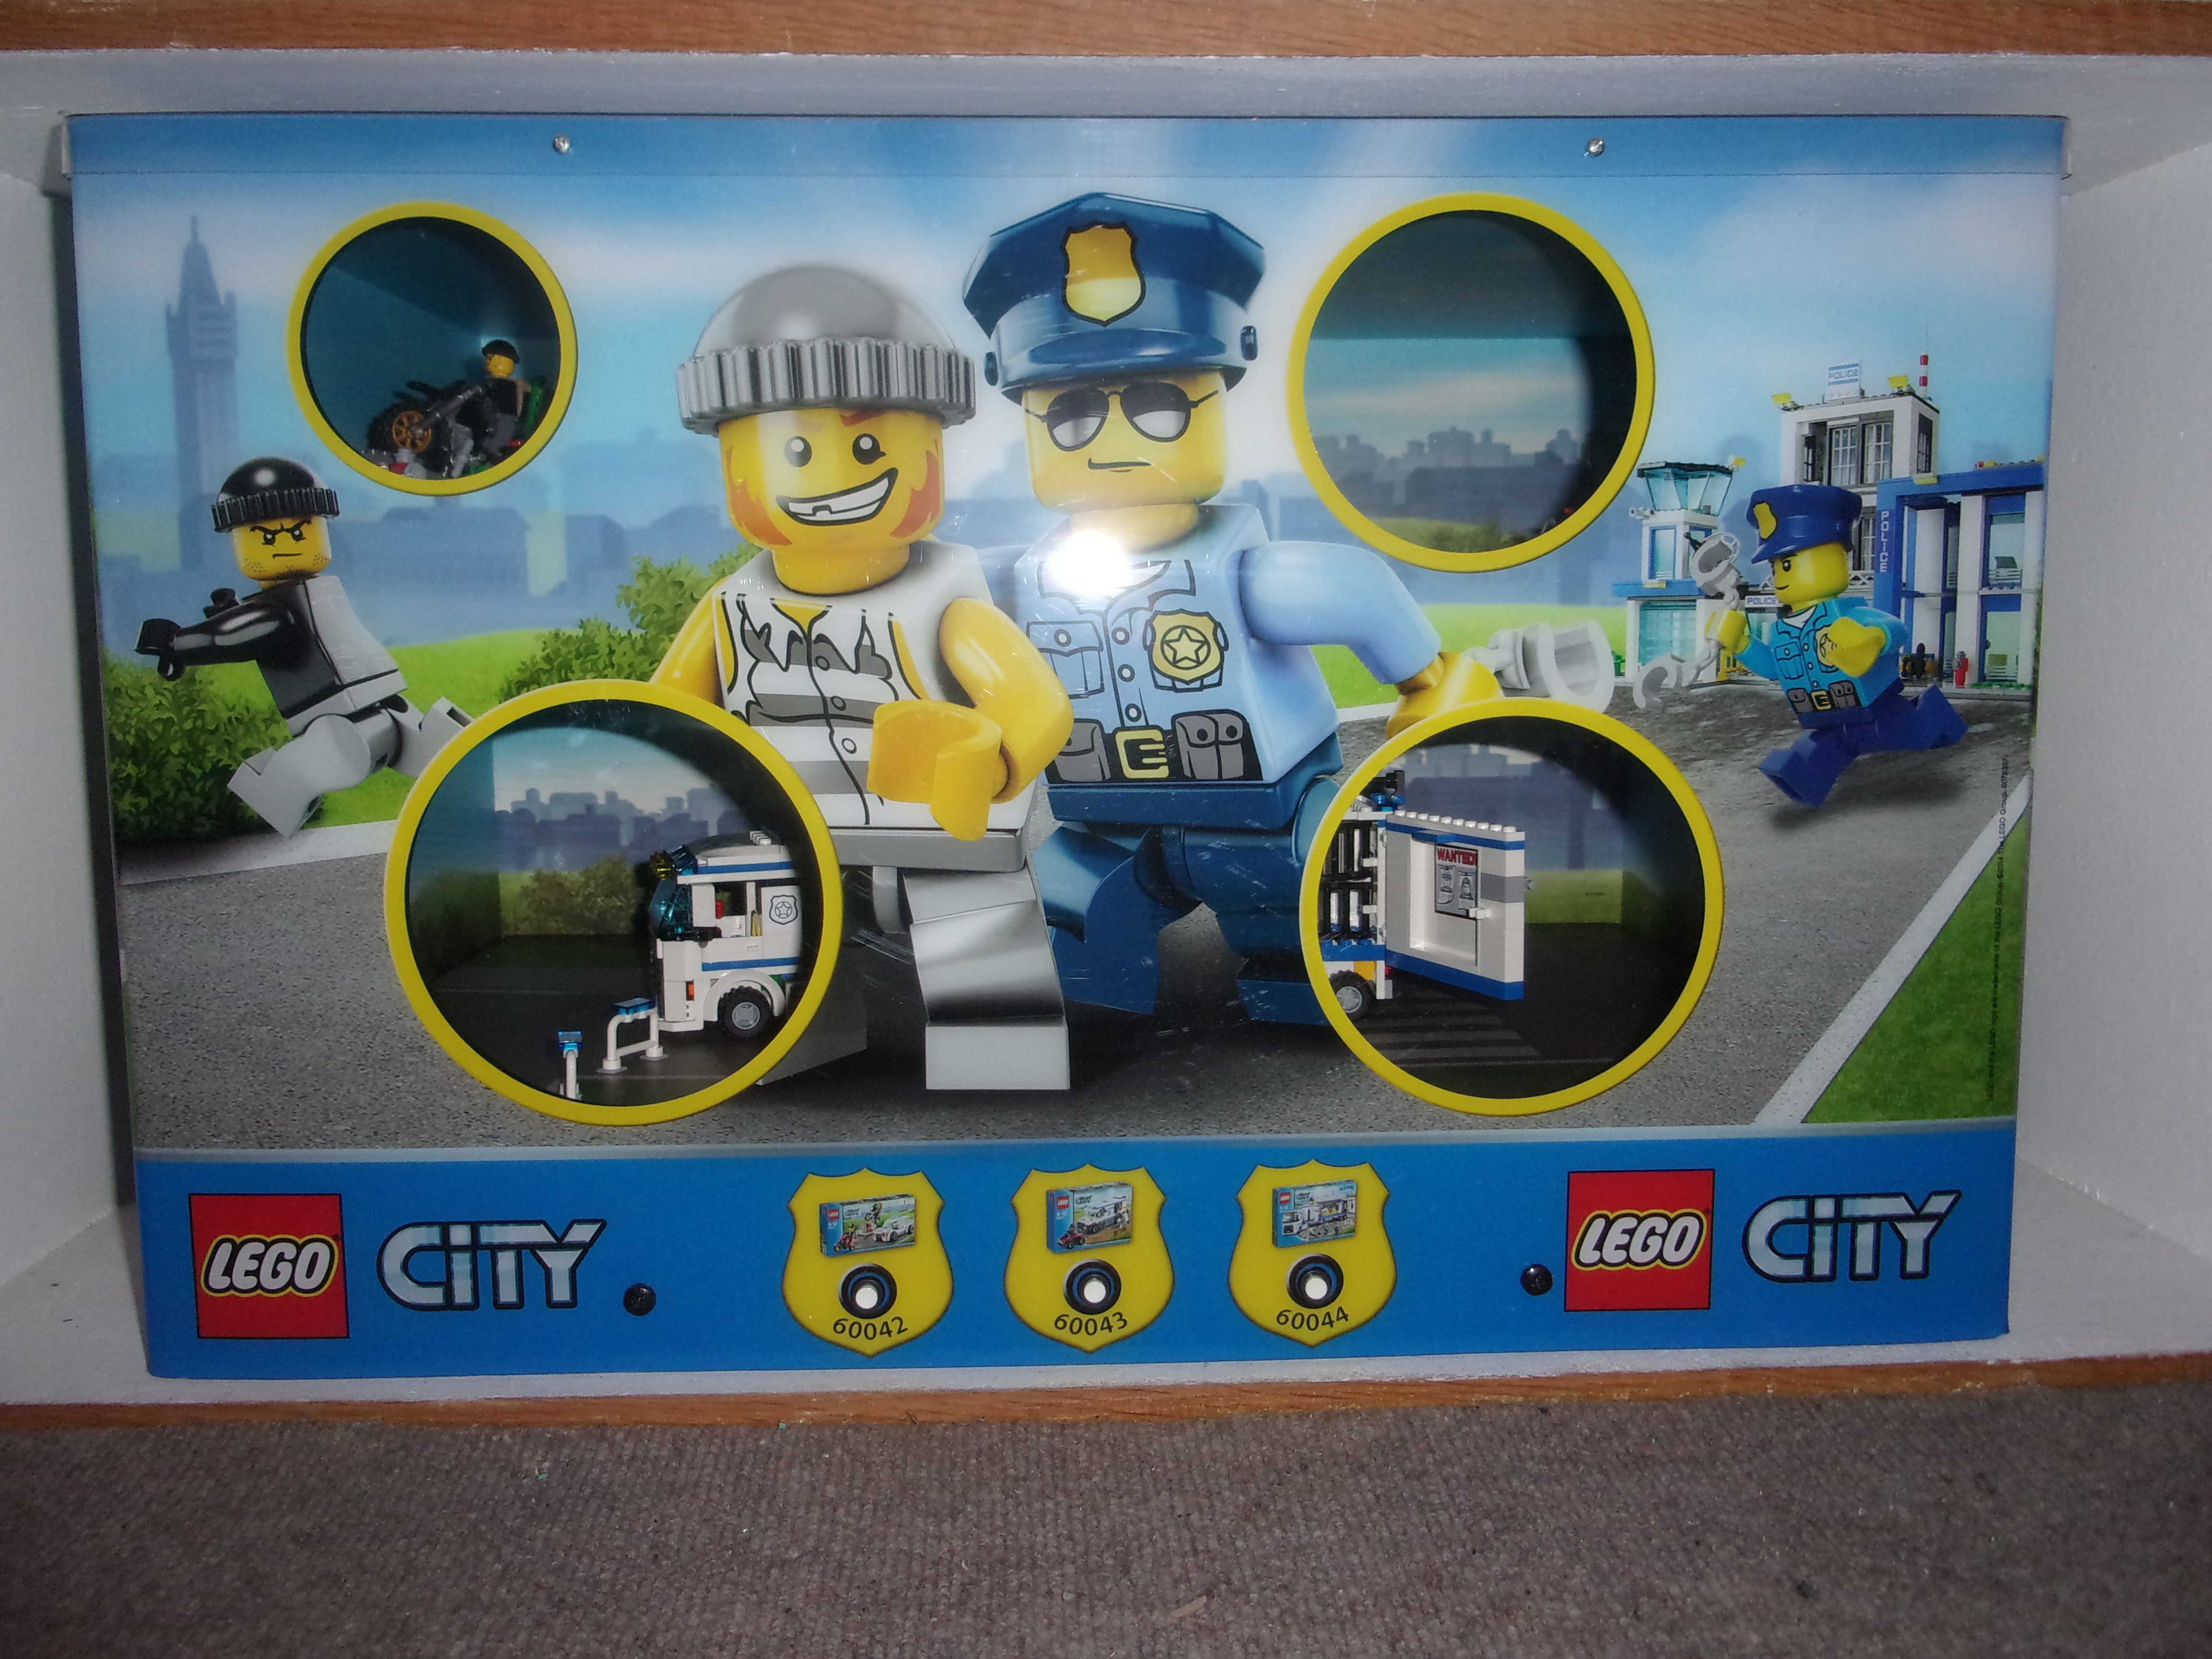 Lego Le Lord Grande La Qgde Jouet Aventure Bisness mN8v0nw